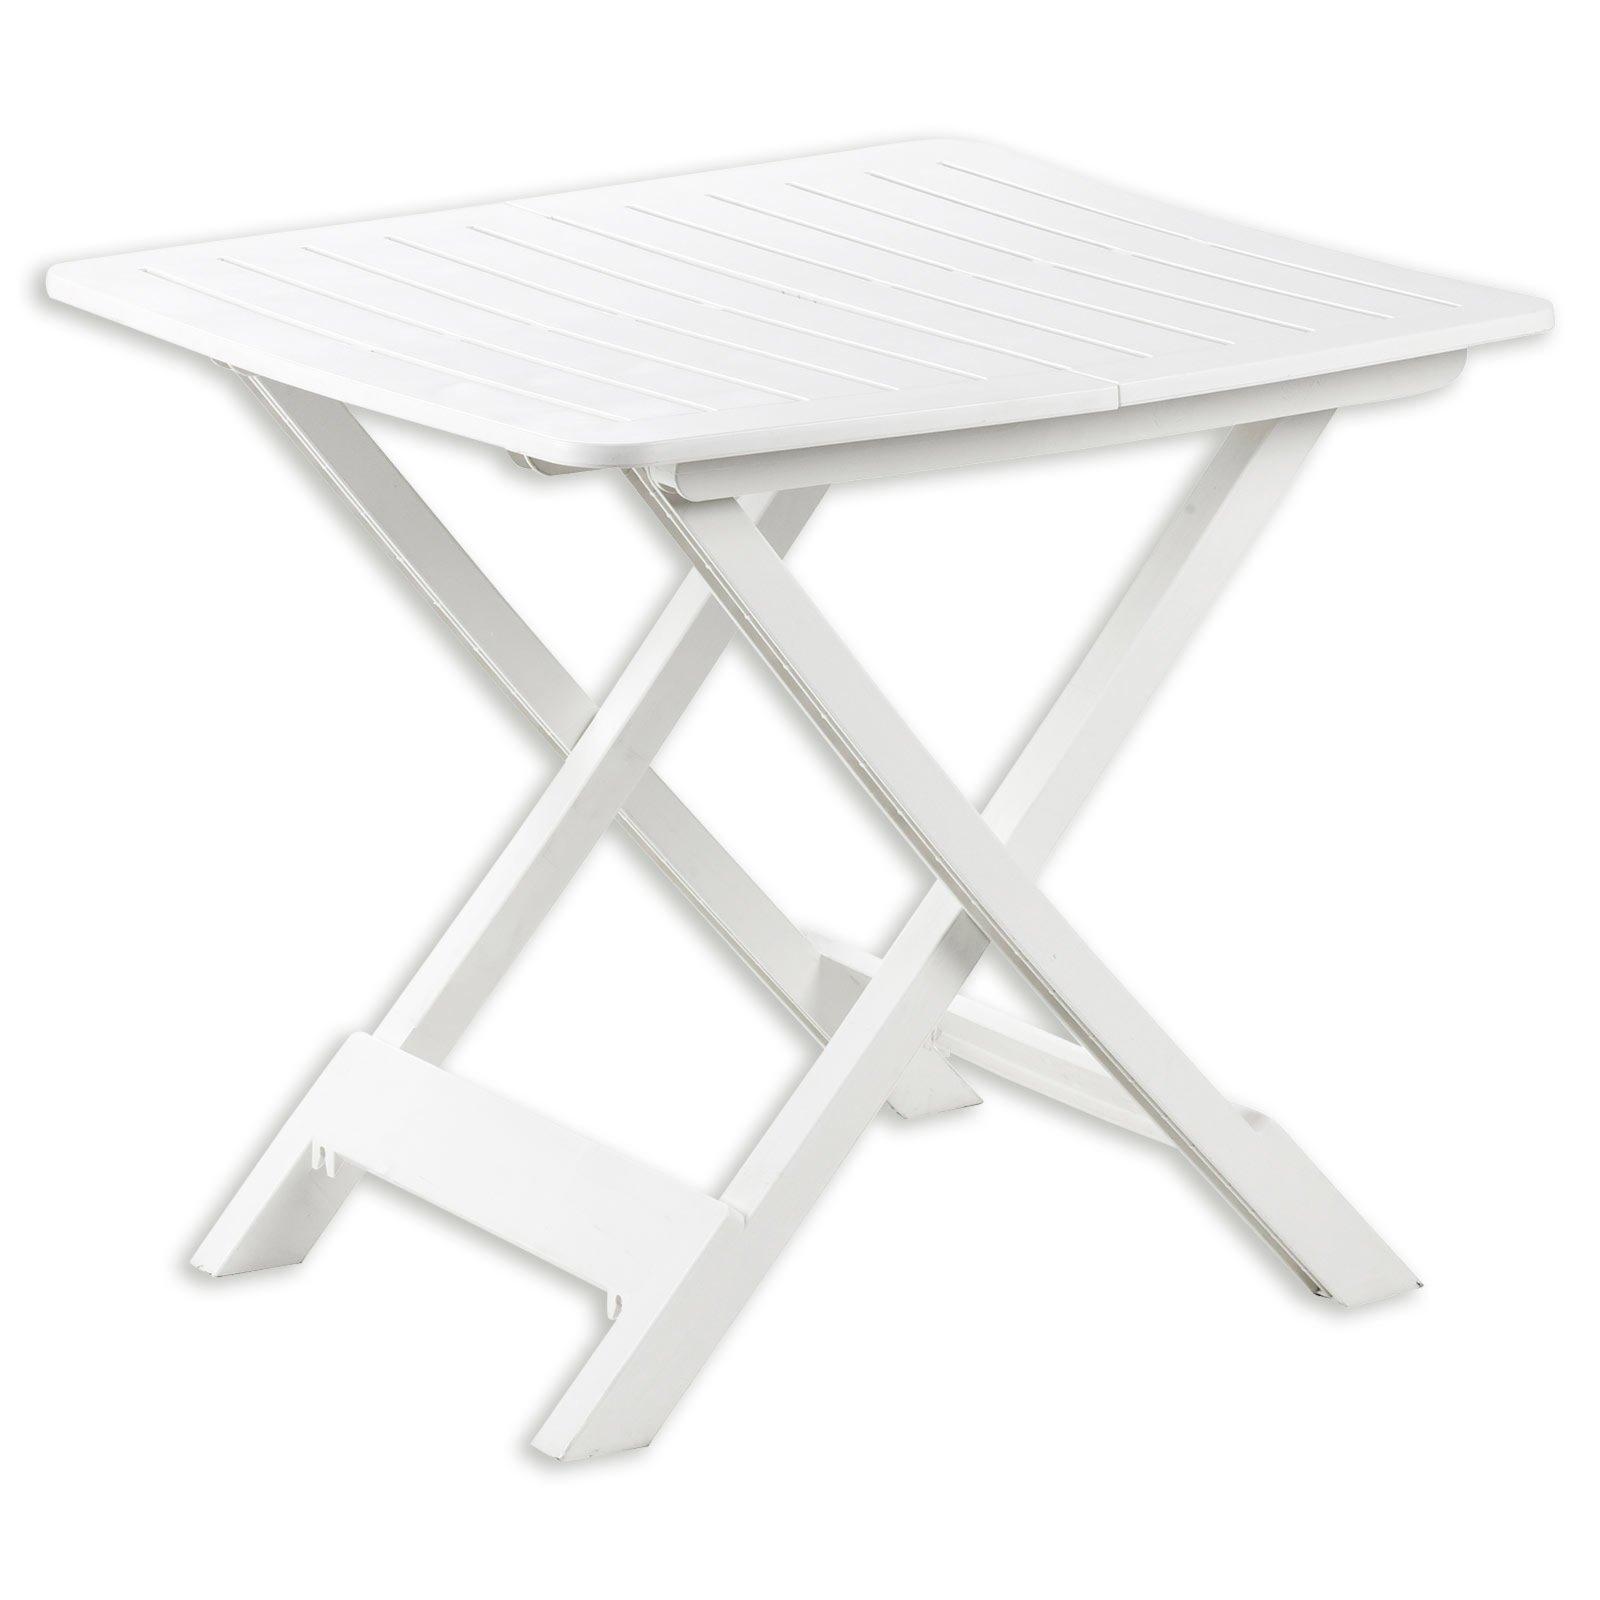 garten klapptisch kunststoff fabulous good zwischen mensch tisch with plastik gartentisch with. Black Bedroom Furniture Sets. Home Design Ideas